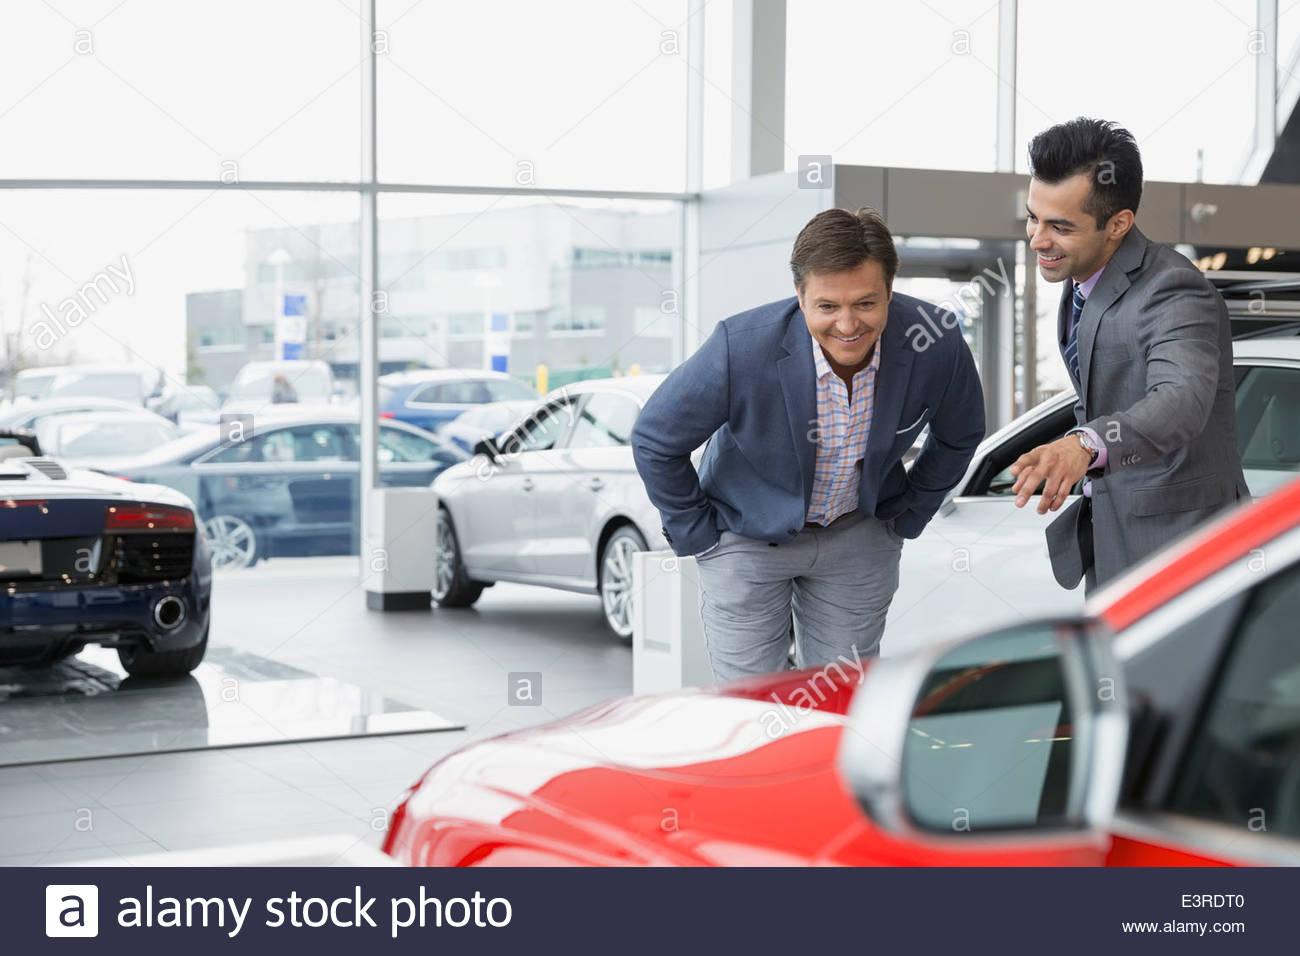 Salesman showing man car in dealership showroom - Stock Image